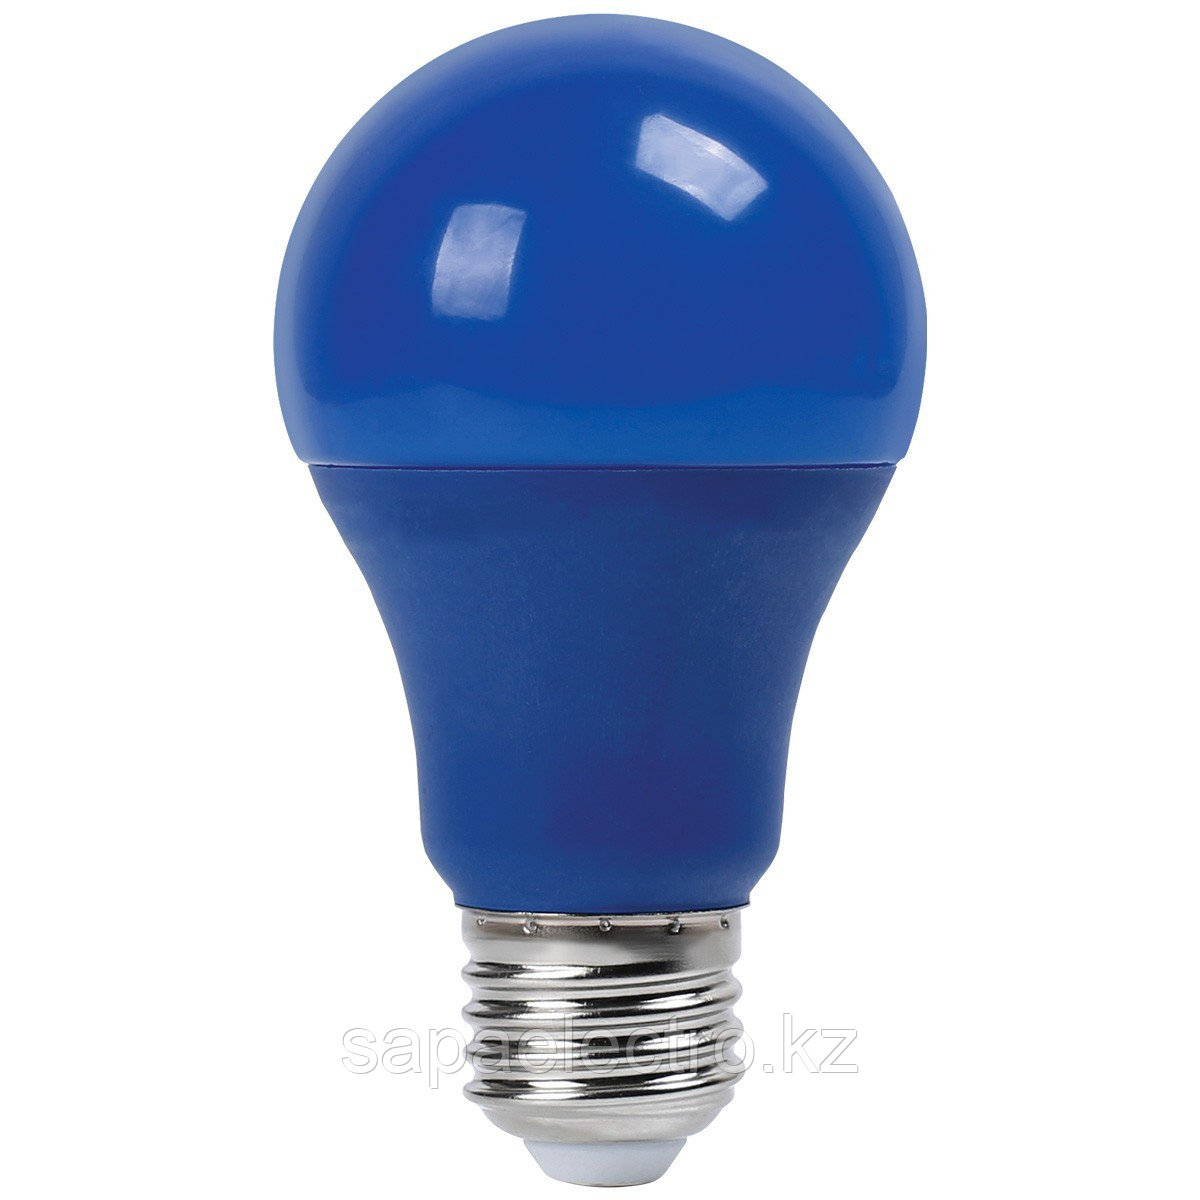 Lampa LED A60 9W E27 BLUE (TECHNOLIGHT) 100sht